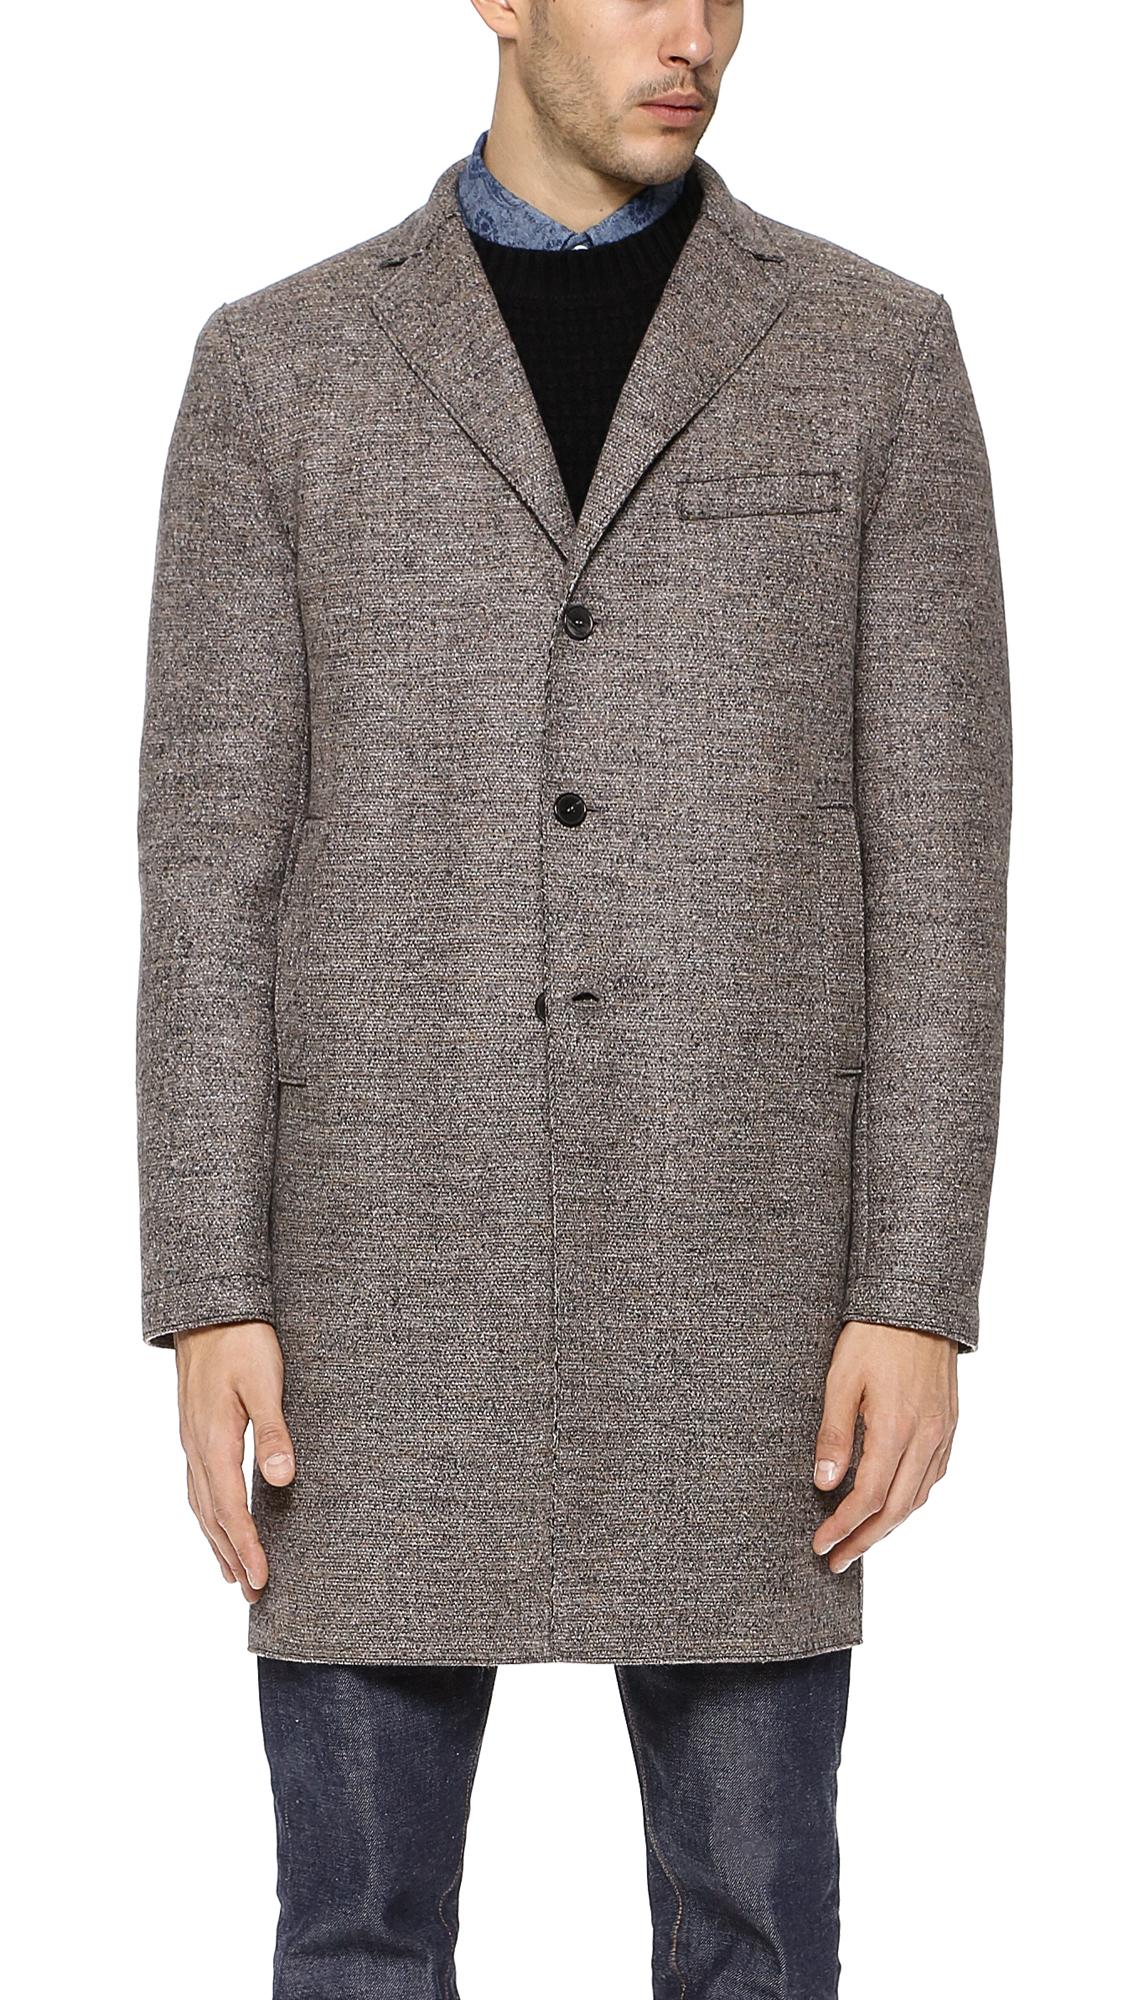 harris wharf london tweed overcoat with tartan interior in brown for men lyst. Black Bedroom Furniture Sets. Home Design Ideas